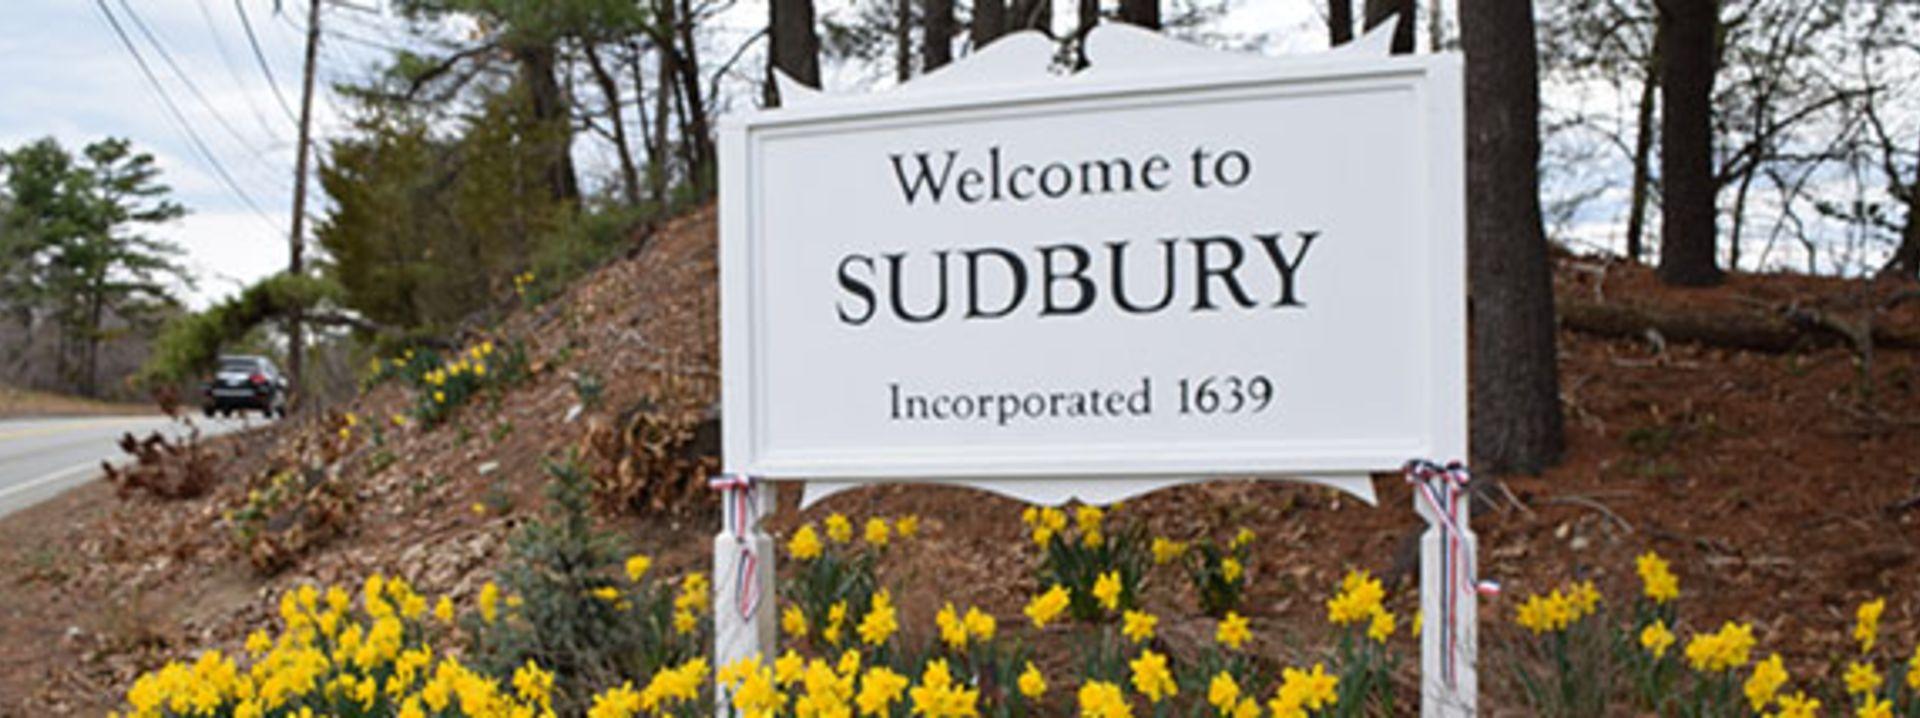 Why Live In Sudbury?!